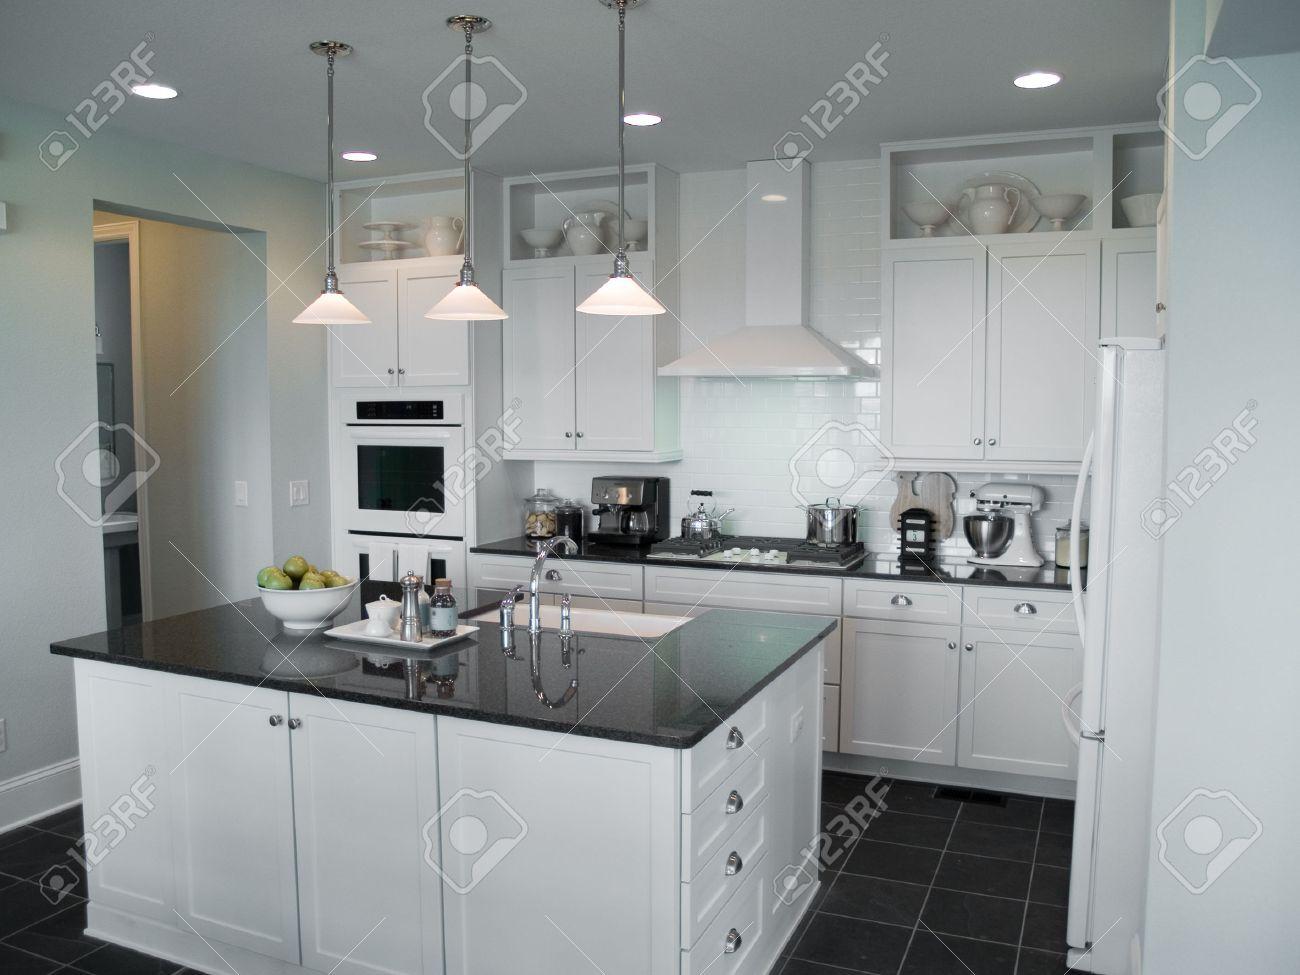 100+ [ Dimensioni Isola Cucina ] | Cucine Con Isola,Voffca Com ...